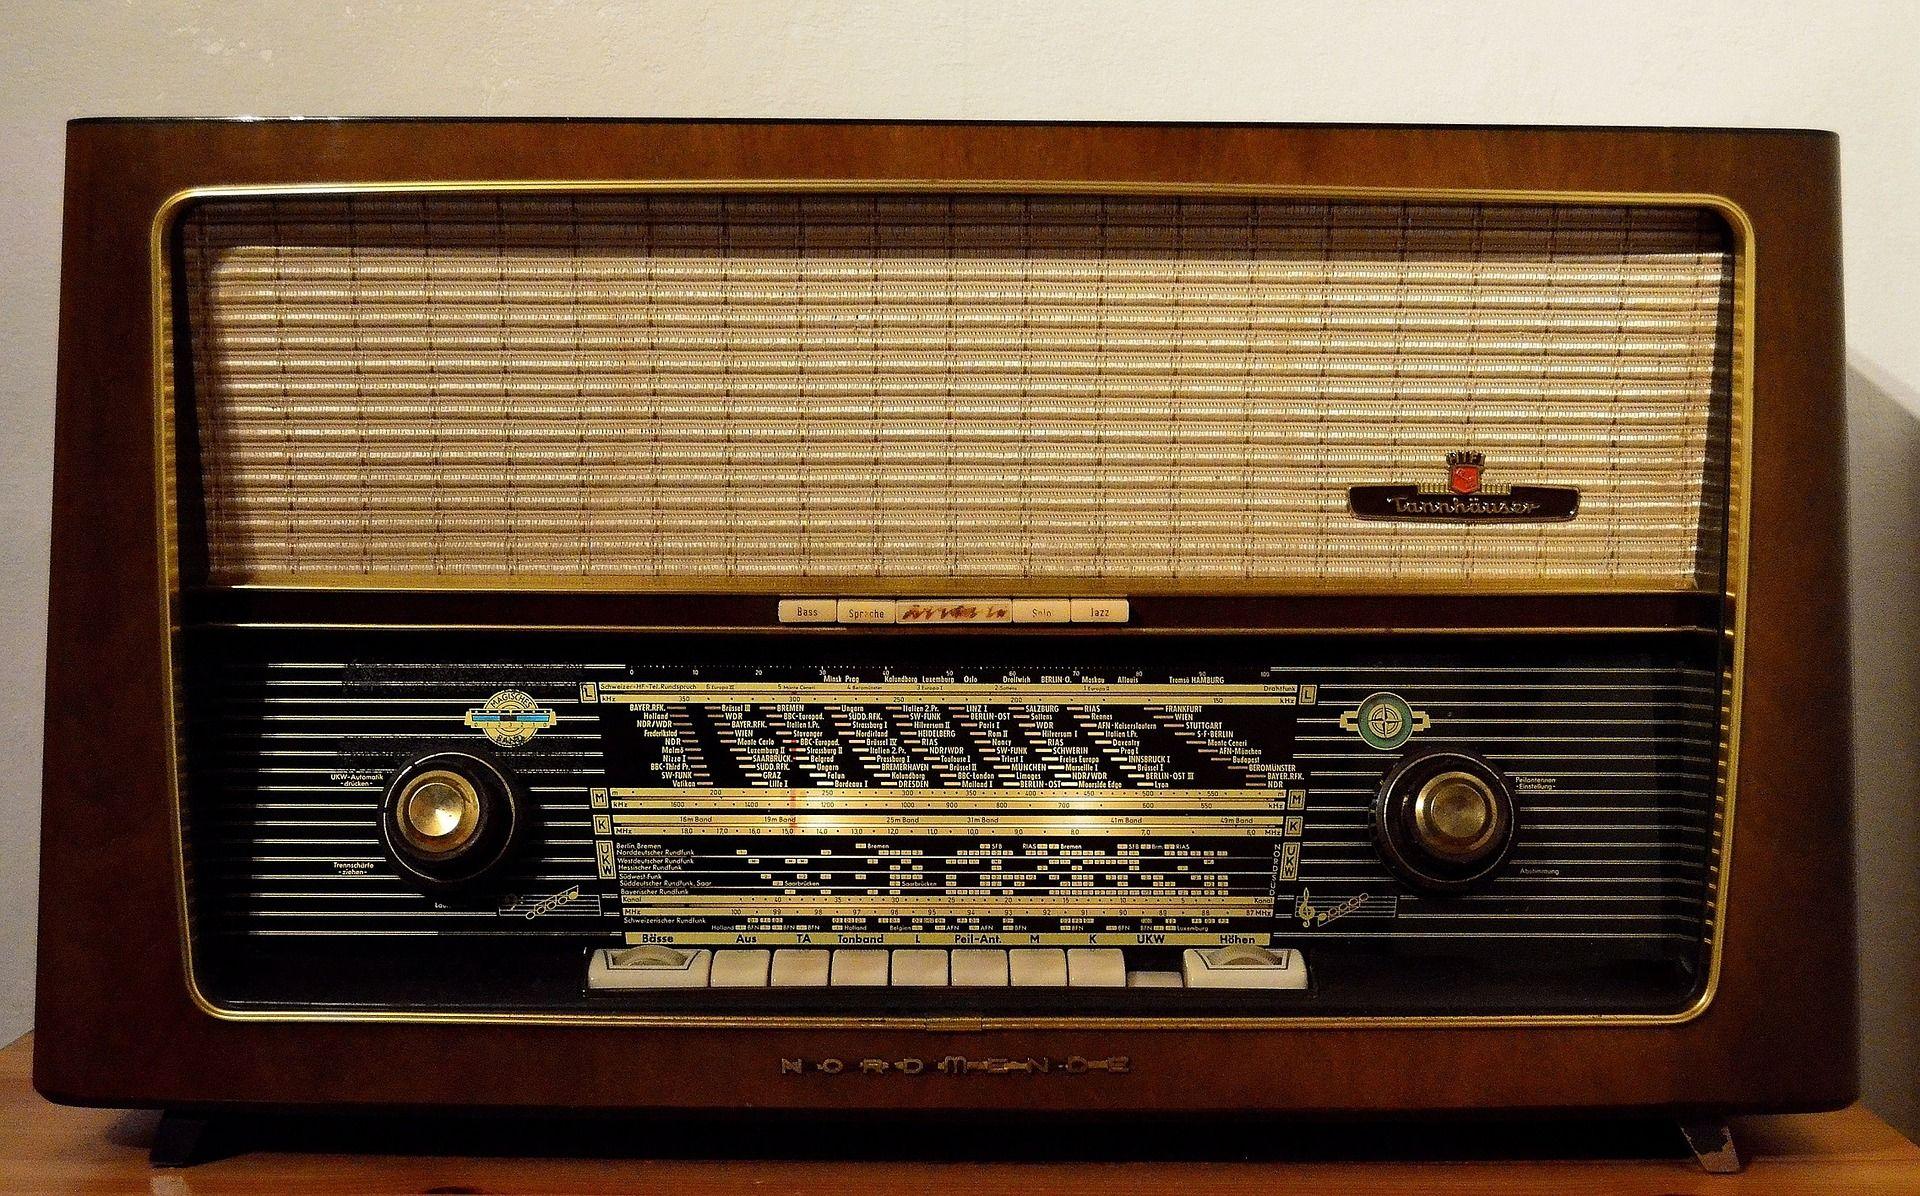 Ilustrasi hobi koleksi barang berupa radio tabung oleh Detmold dari pixabay.com